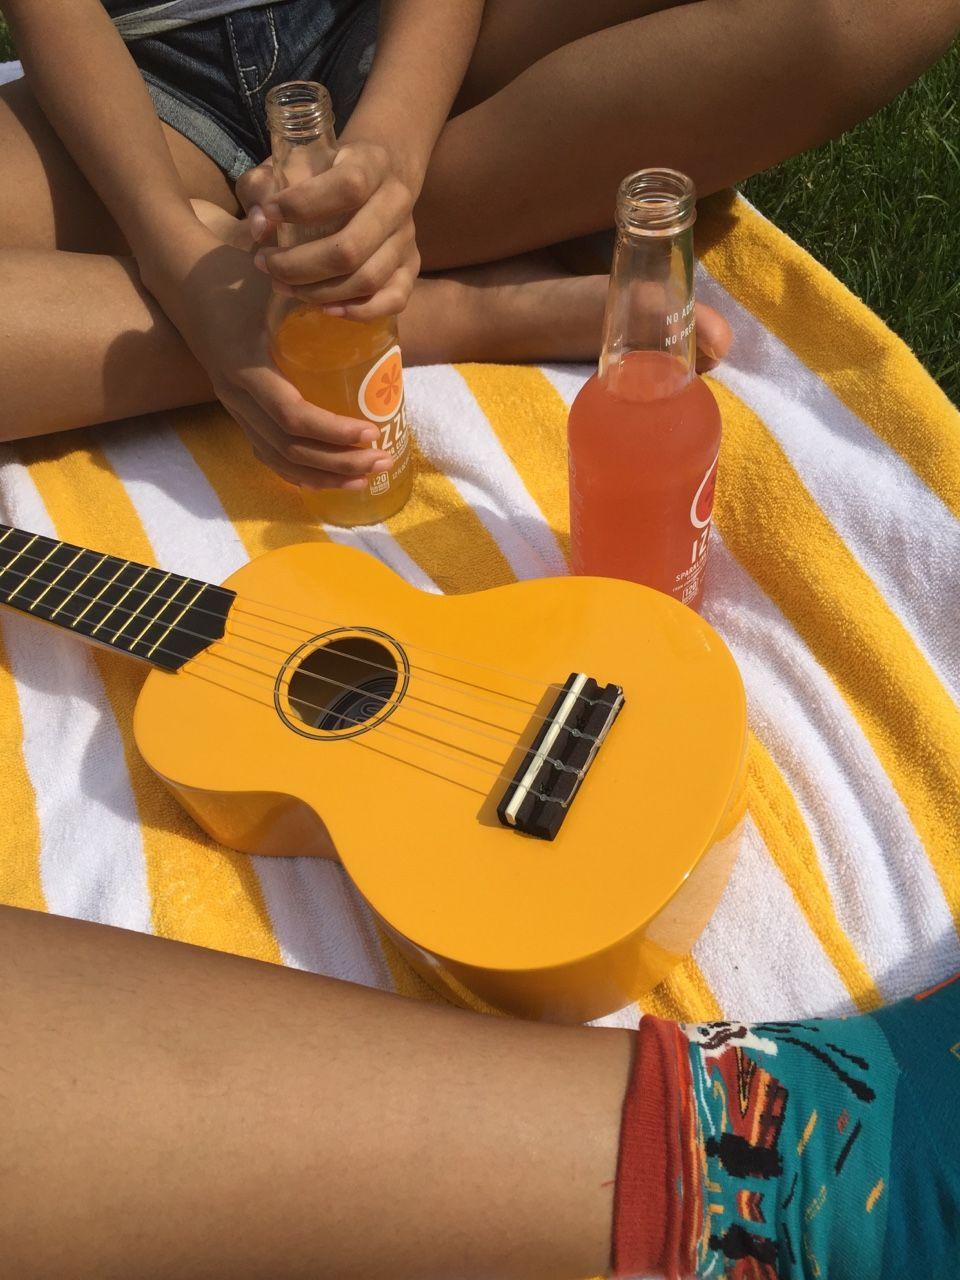 nike air force 1 black ukulele tumblr png images